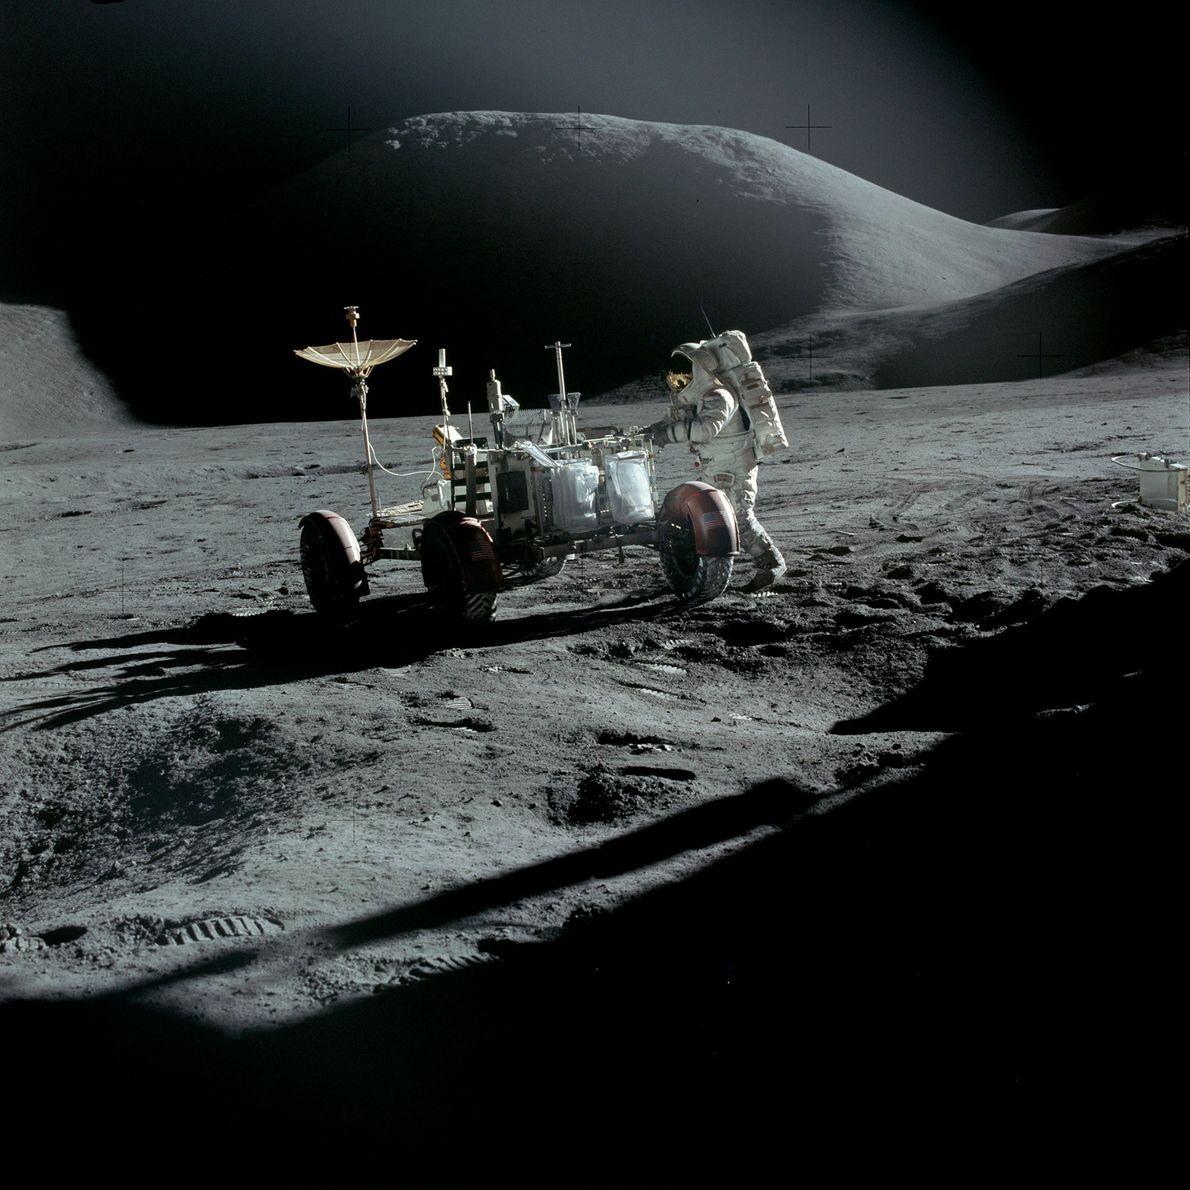 Astronaut James B. Irwin with Apollo 15's Lunar Roving Vehicle.